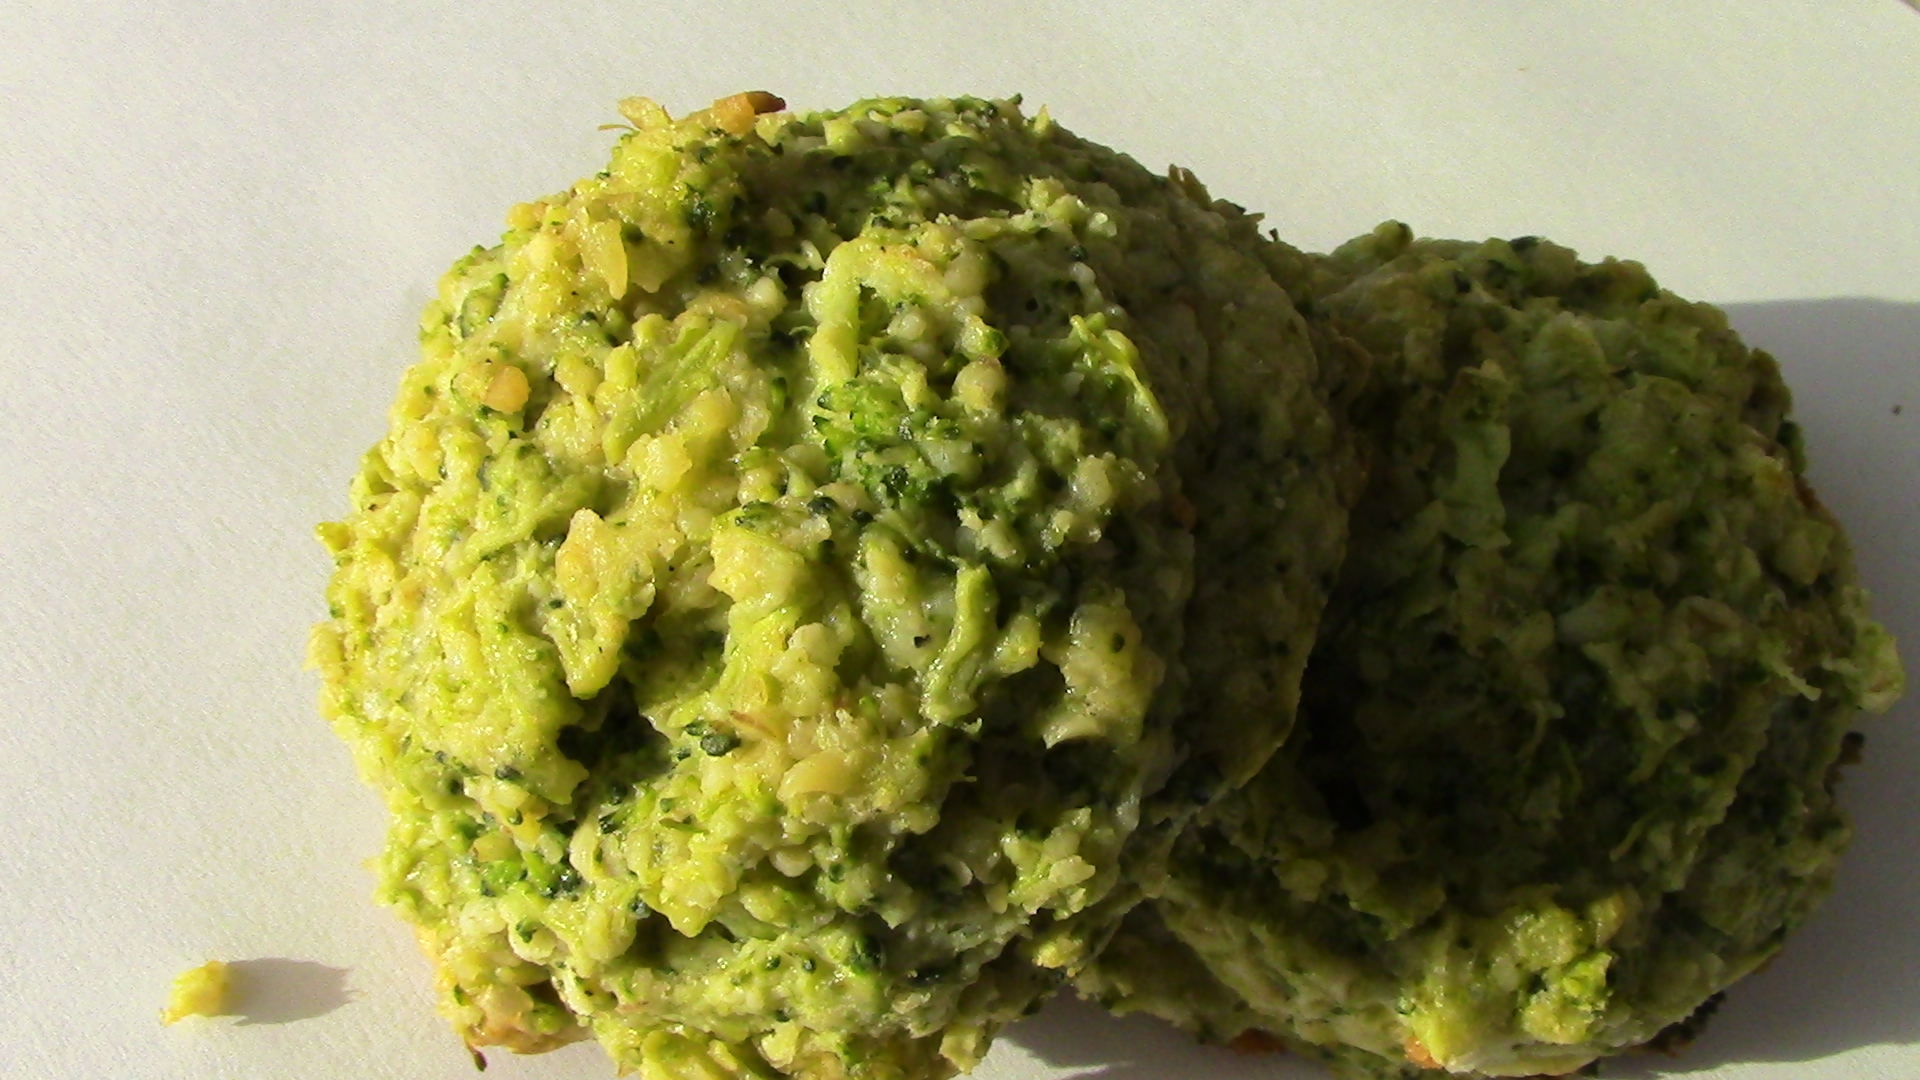 HFFG's Cheesy Broccoli Bites (Gluten-Free w/ Grain-Free Option) Recipe